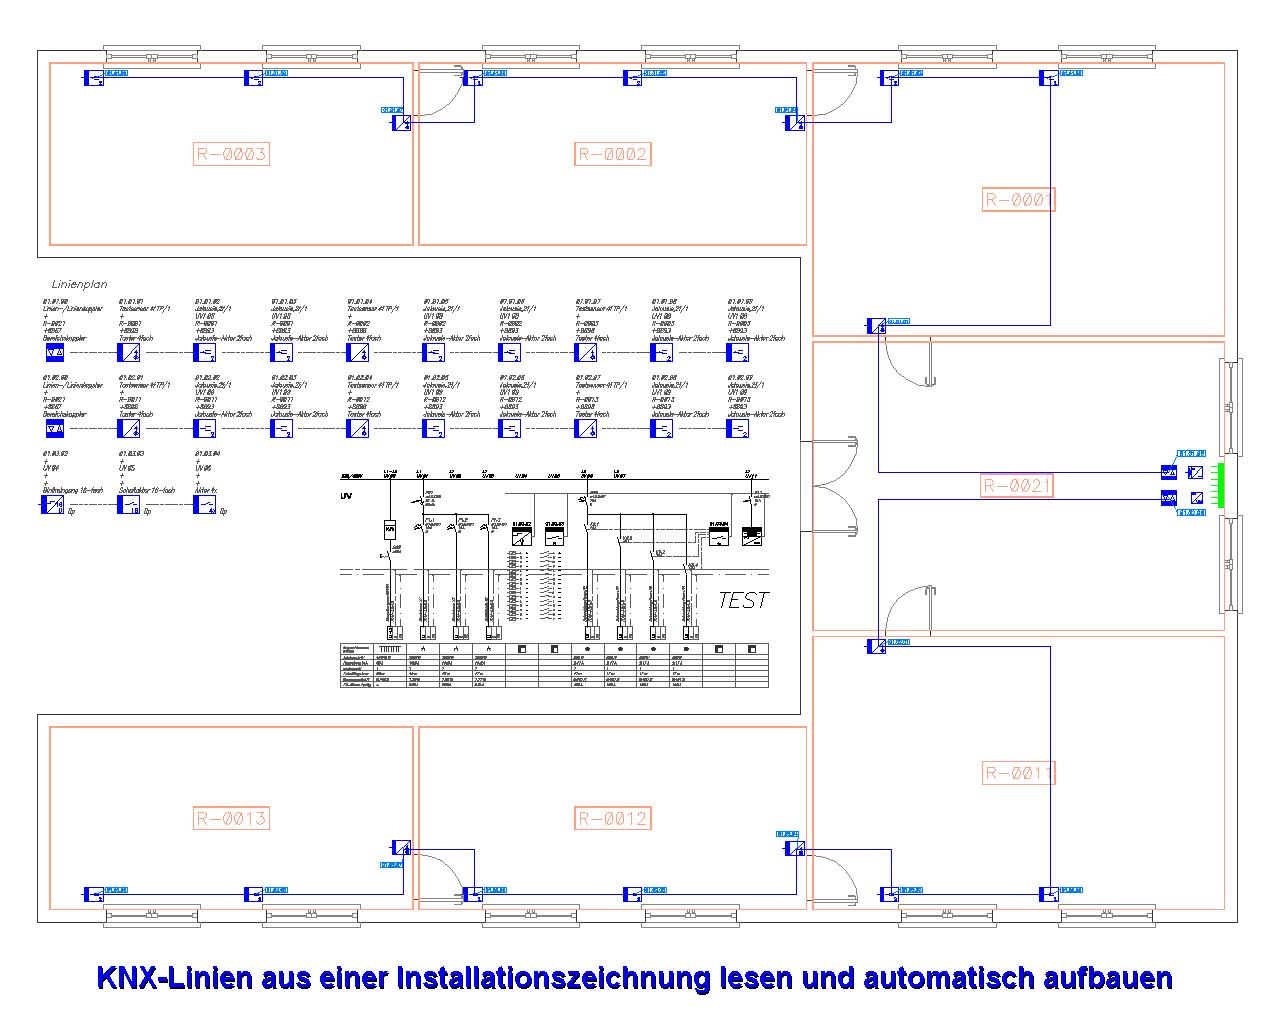 Fantastisch Automatische Verkabelung Reparatur Galerie - Schaltplan ...